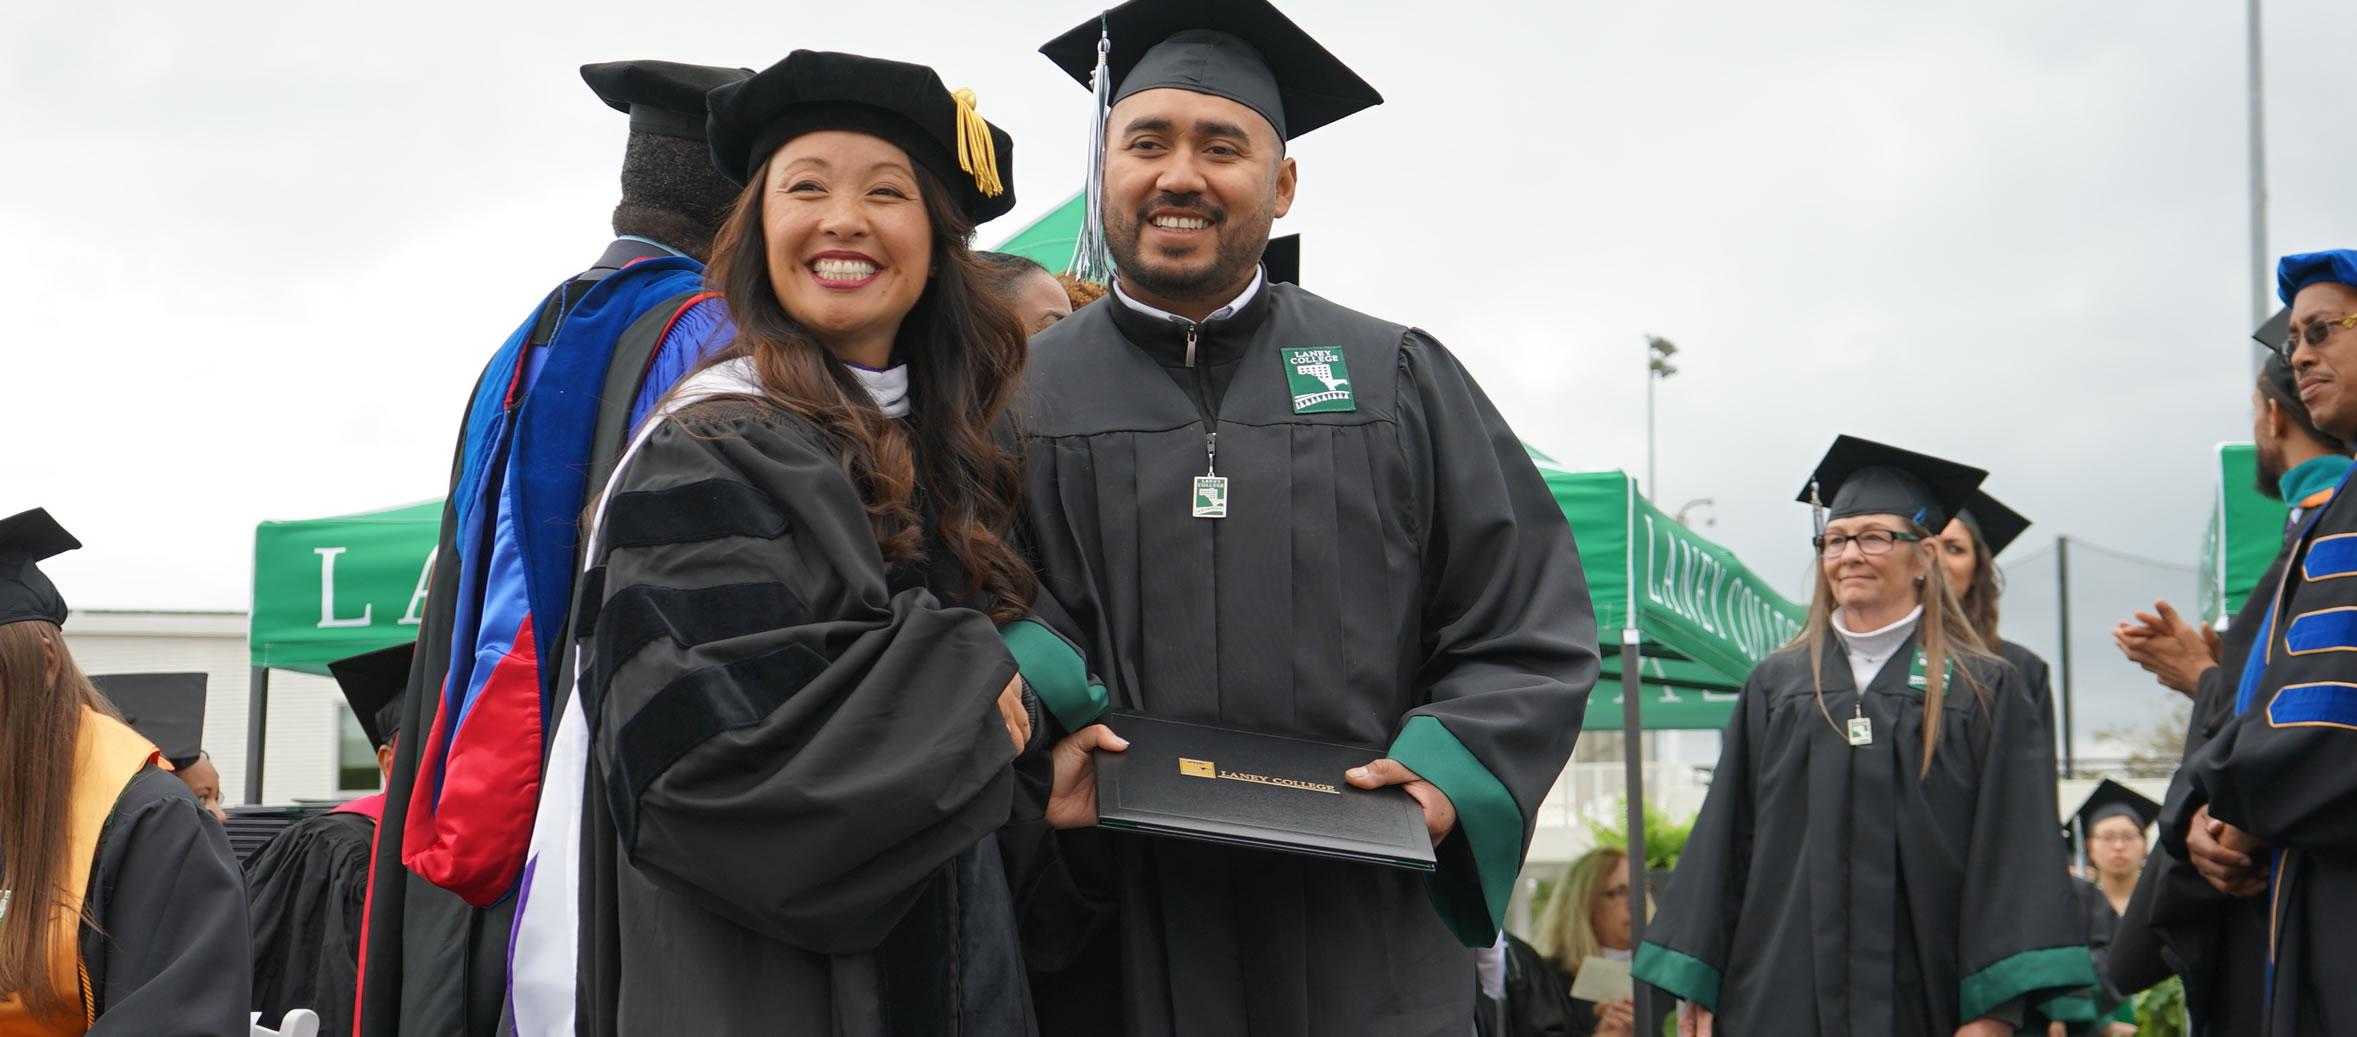 Congratulation Class of 2018 Graduates